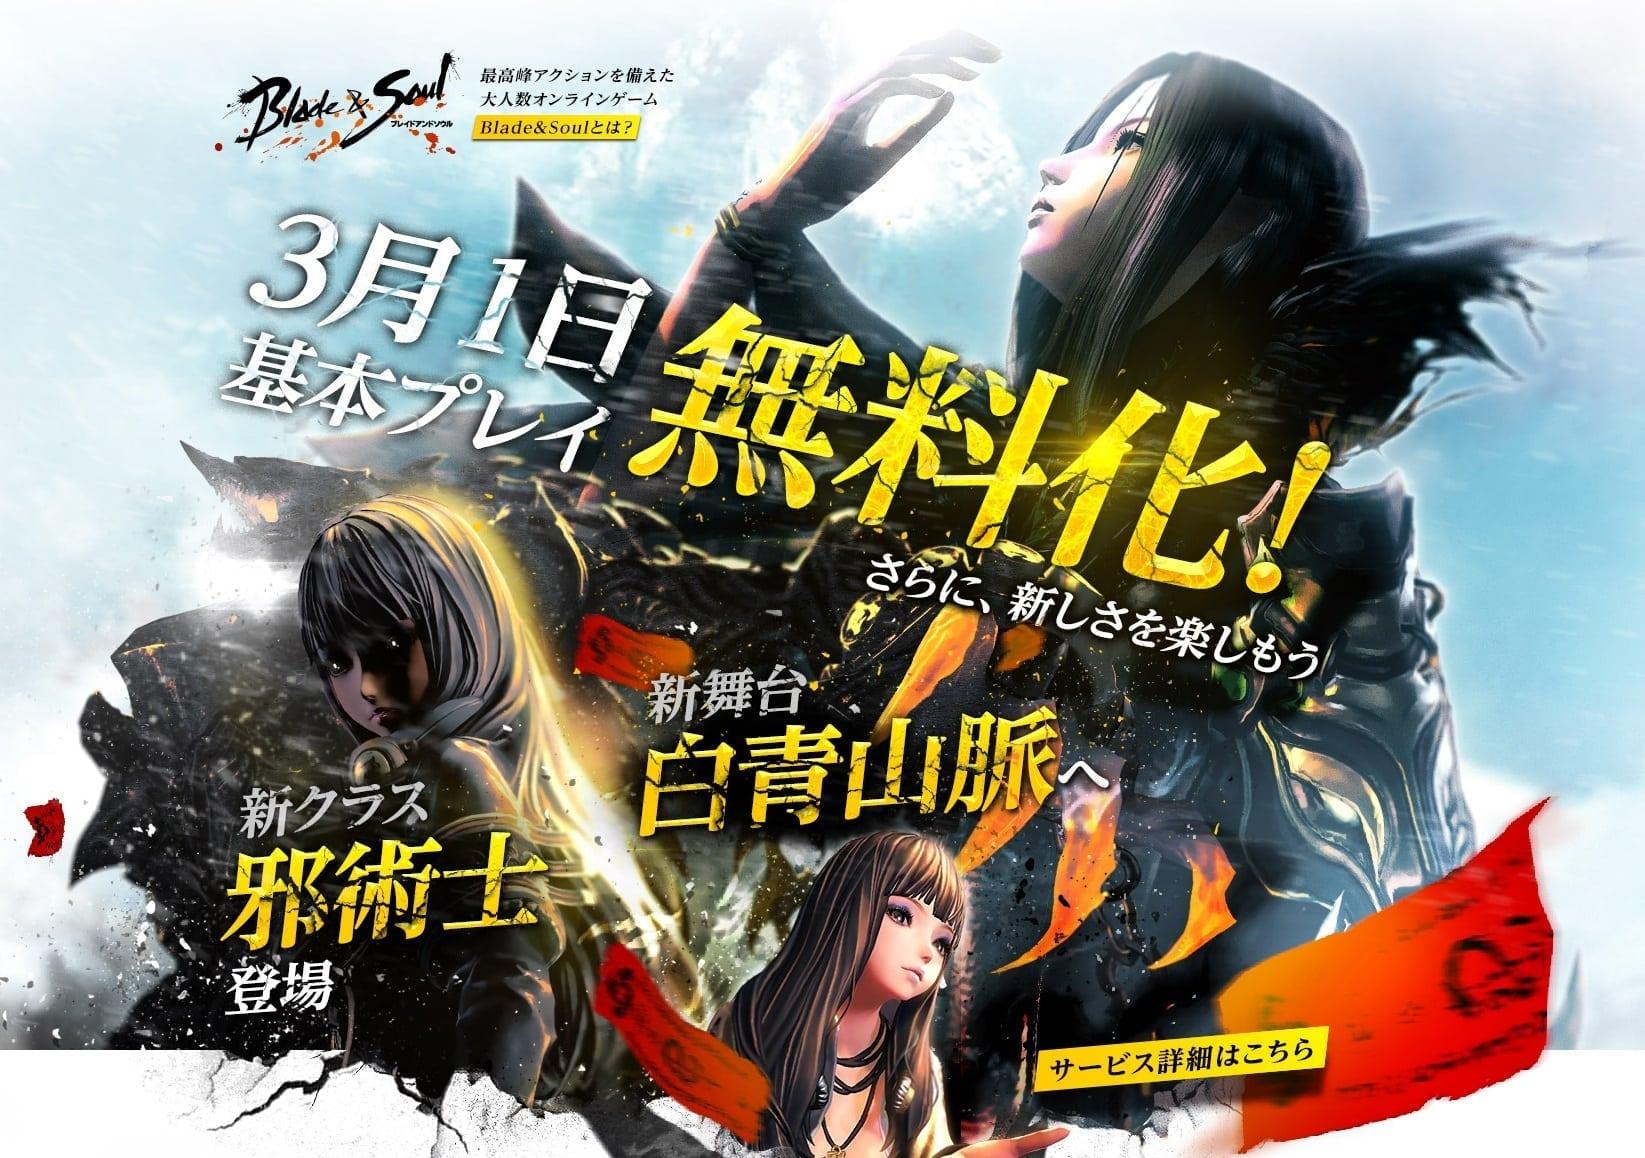 Blade & Soul Japan - F2P image